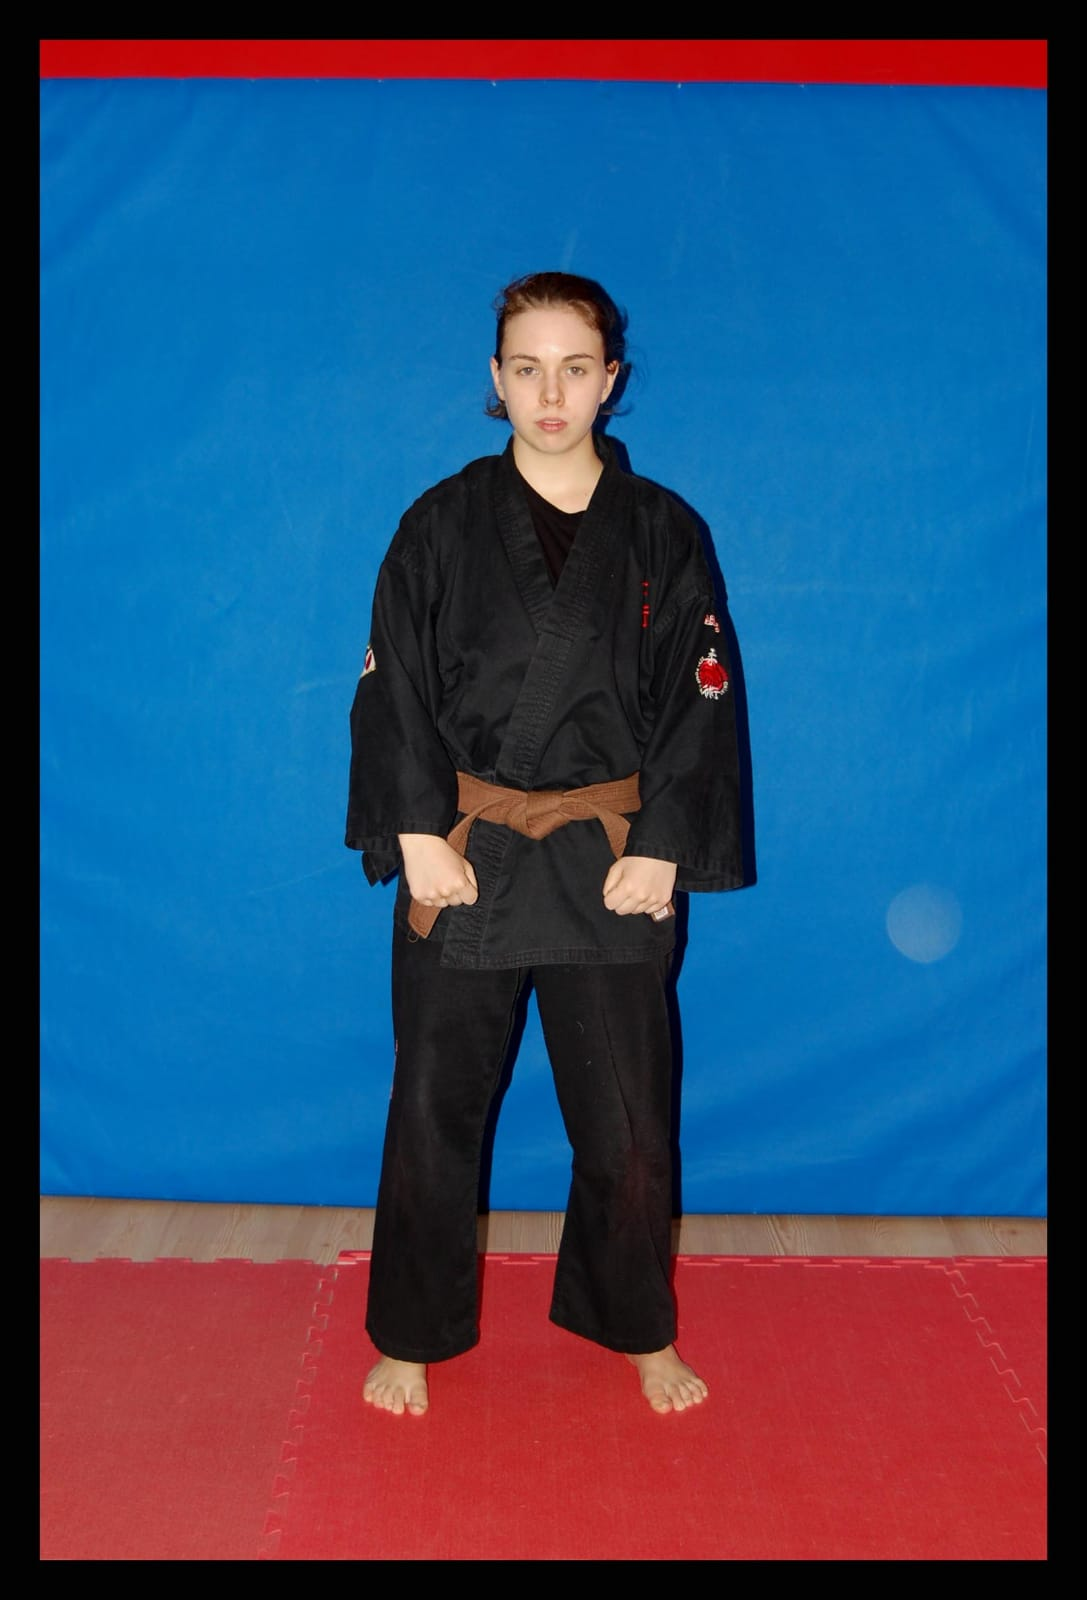 Praticante Elisa Mattei   a.s.d. yu dojo bushido ryu Pomezia